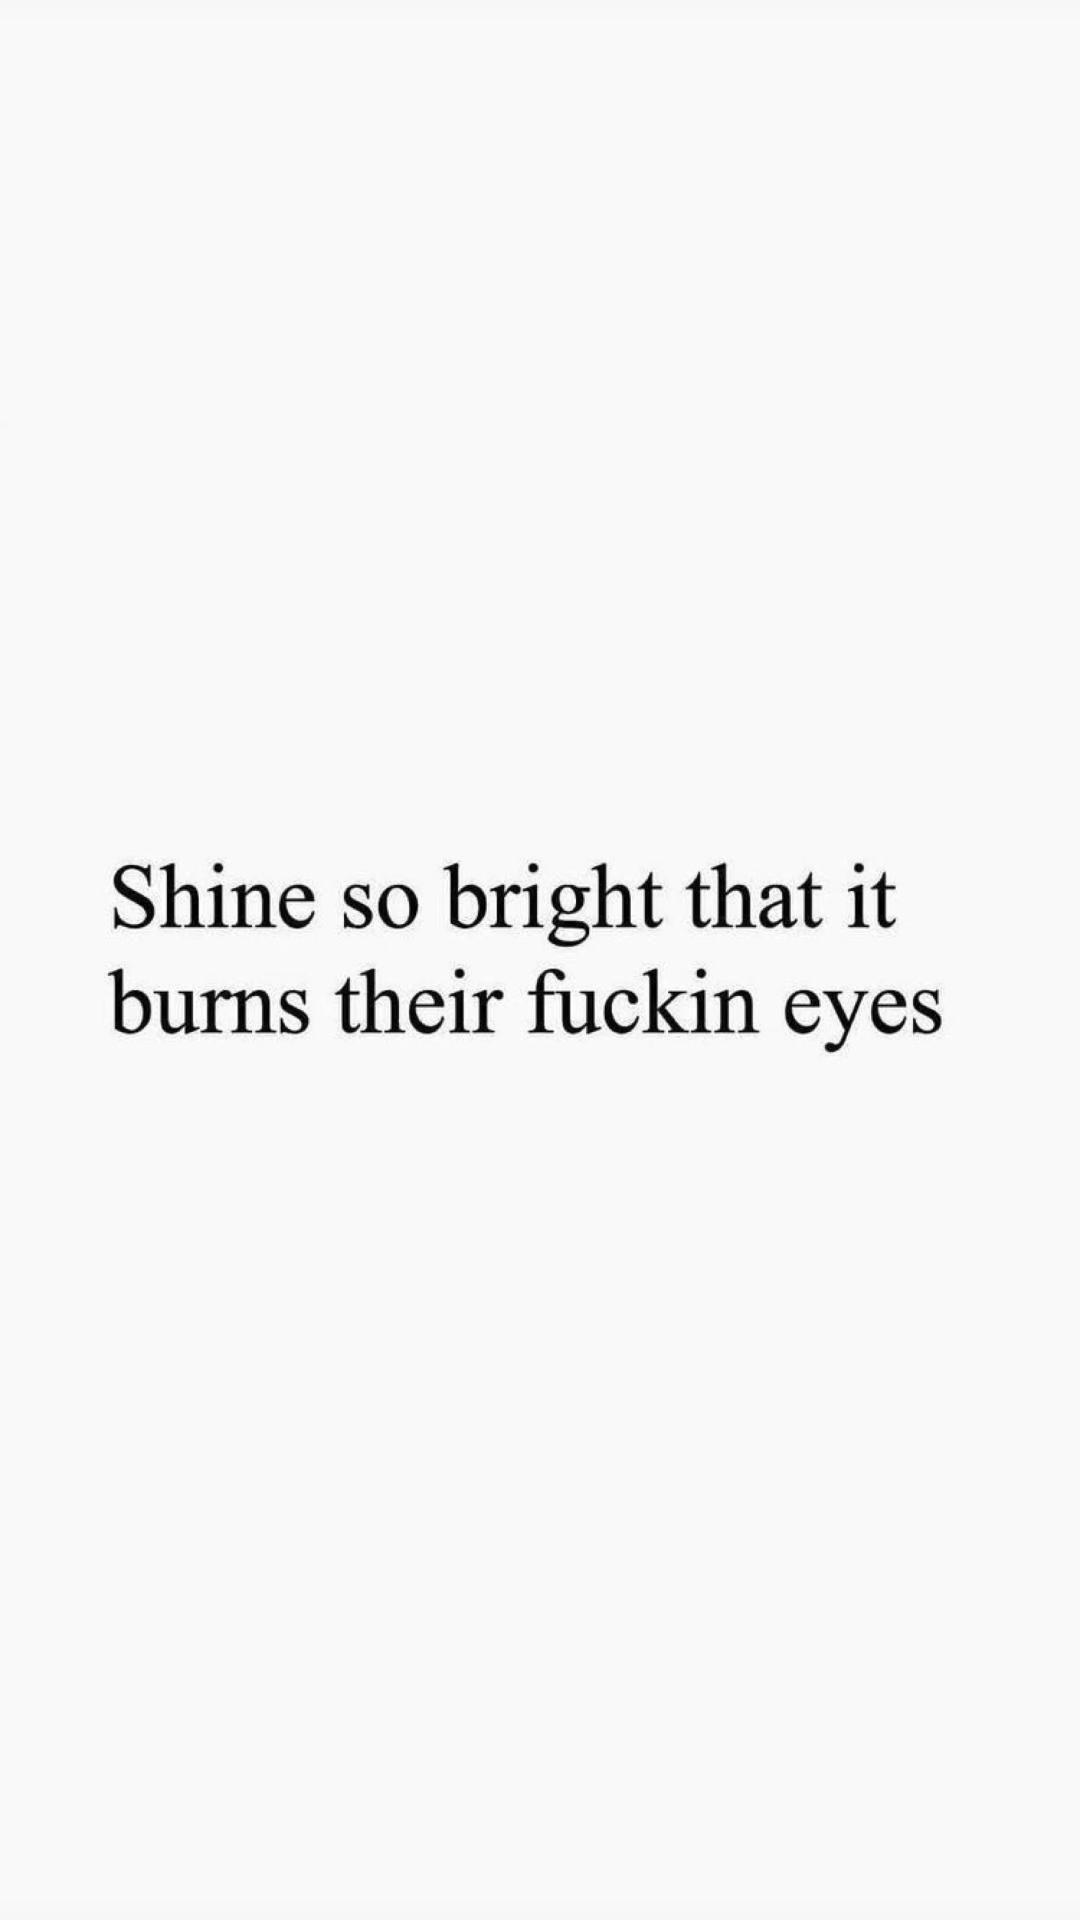 Just a little reminder 😉